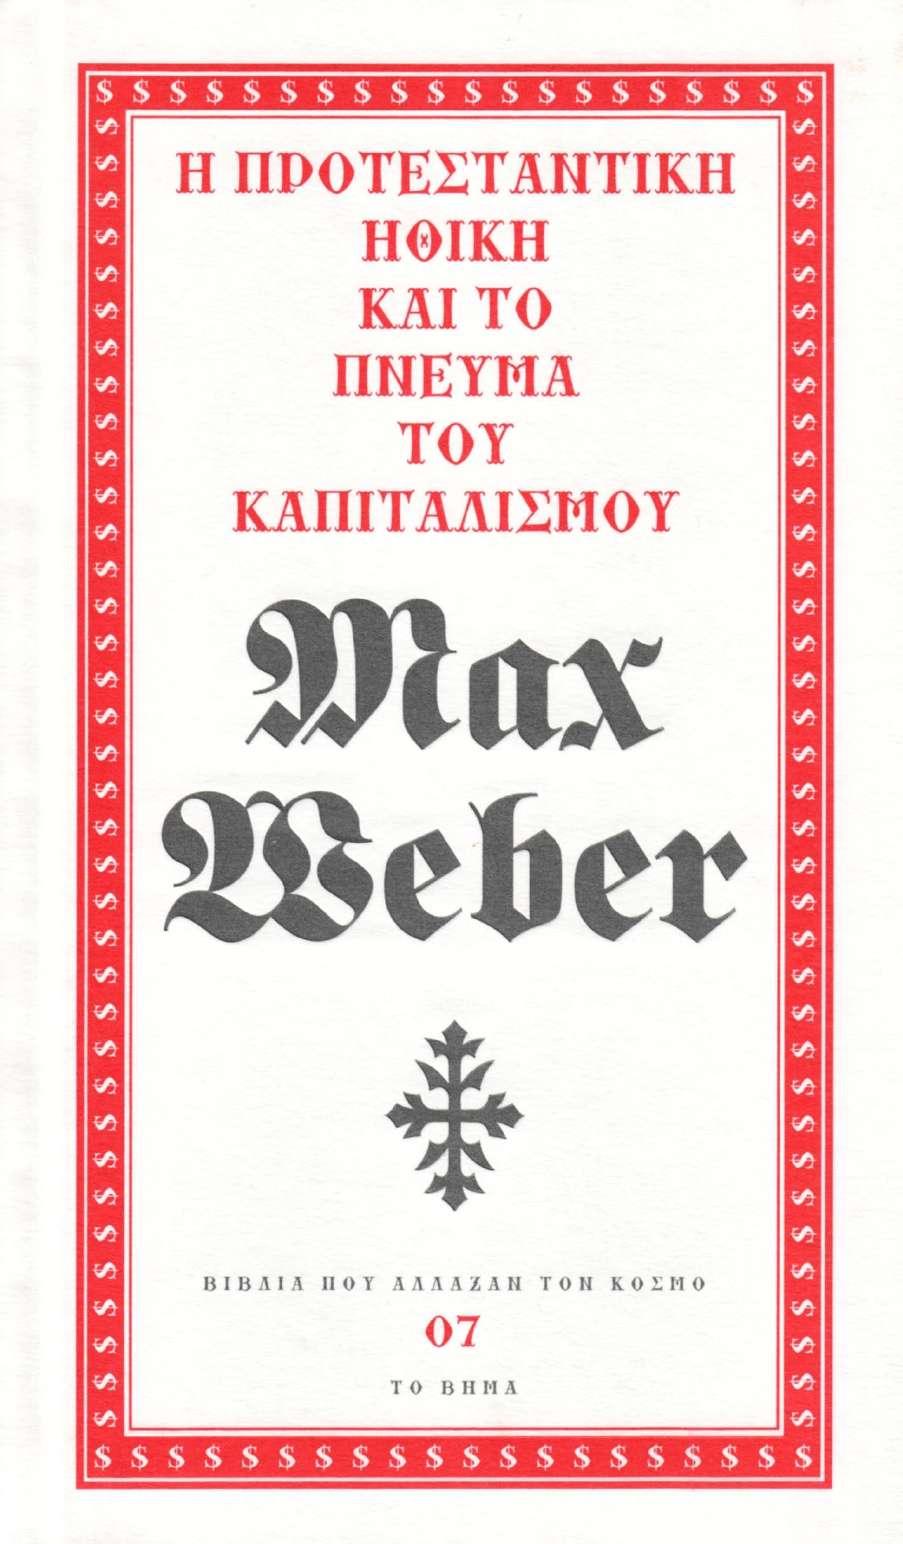 Max Weber - Η προτεσταντική ηθική και το πνεύμα του. Μετάφραση: Δημοσθένης Κούρτοβικ Ειδική έκδοση για την εφημερίδα ΤΟ ΒΗΜΑ, 2010.